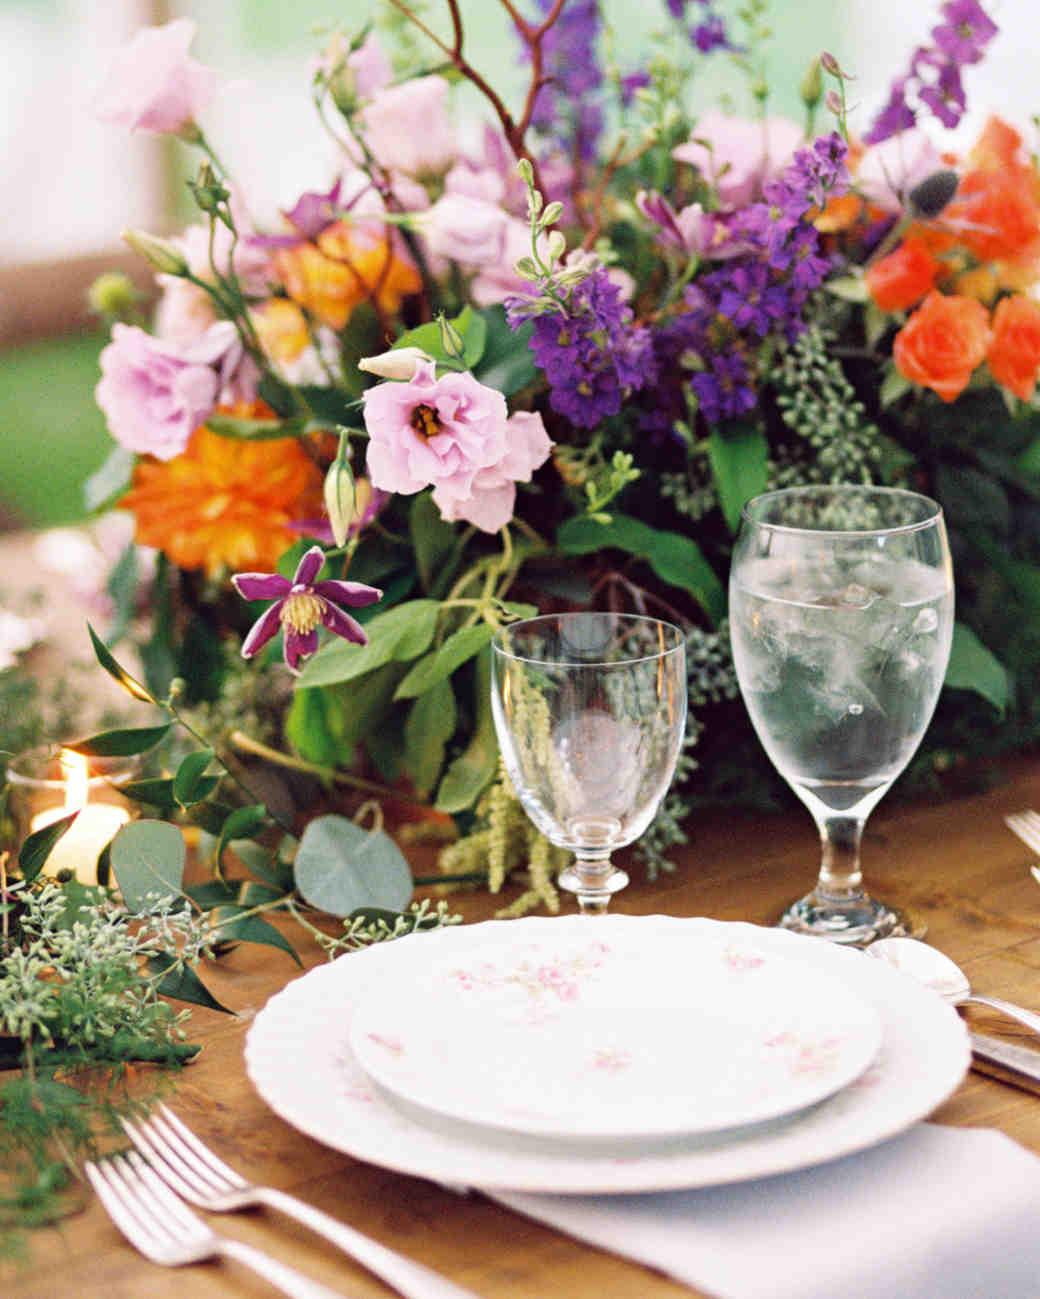 whitney-matt-wedding-centerpiece-439-s111817-0215.jpg